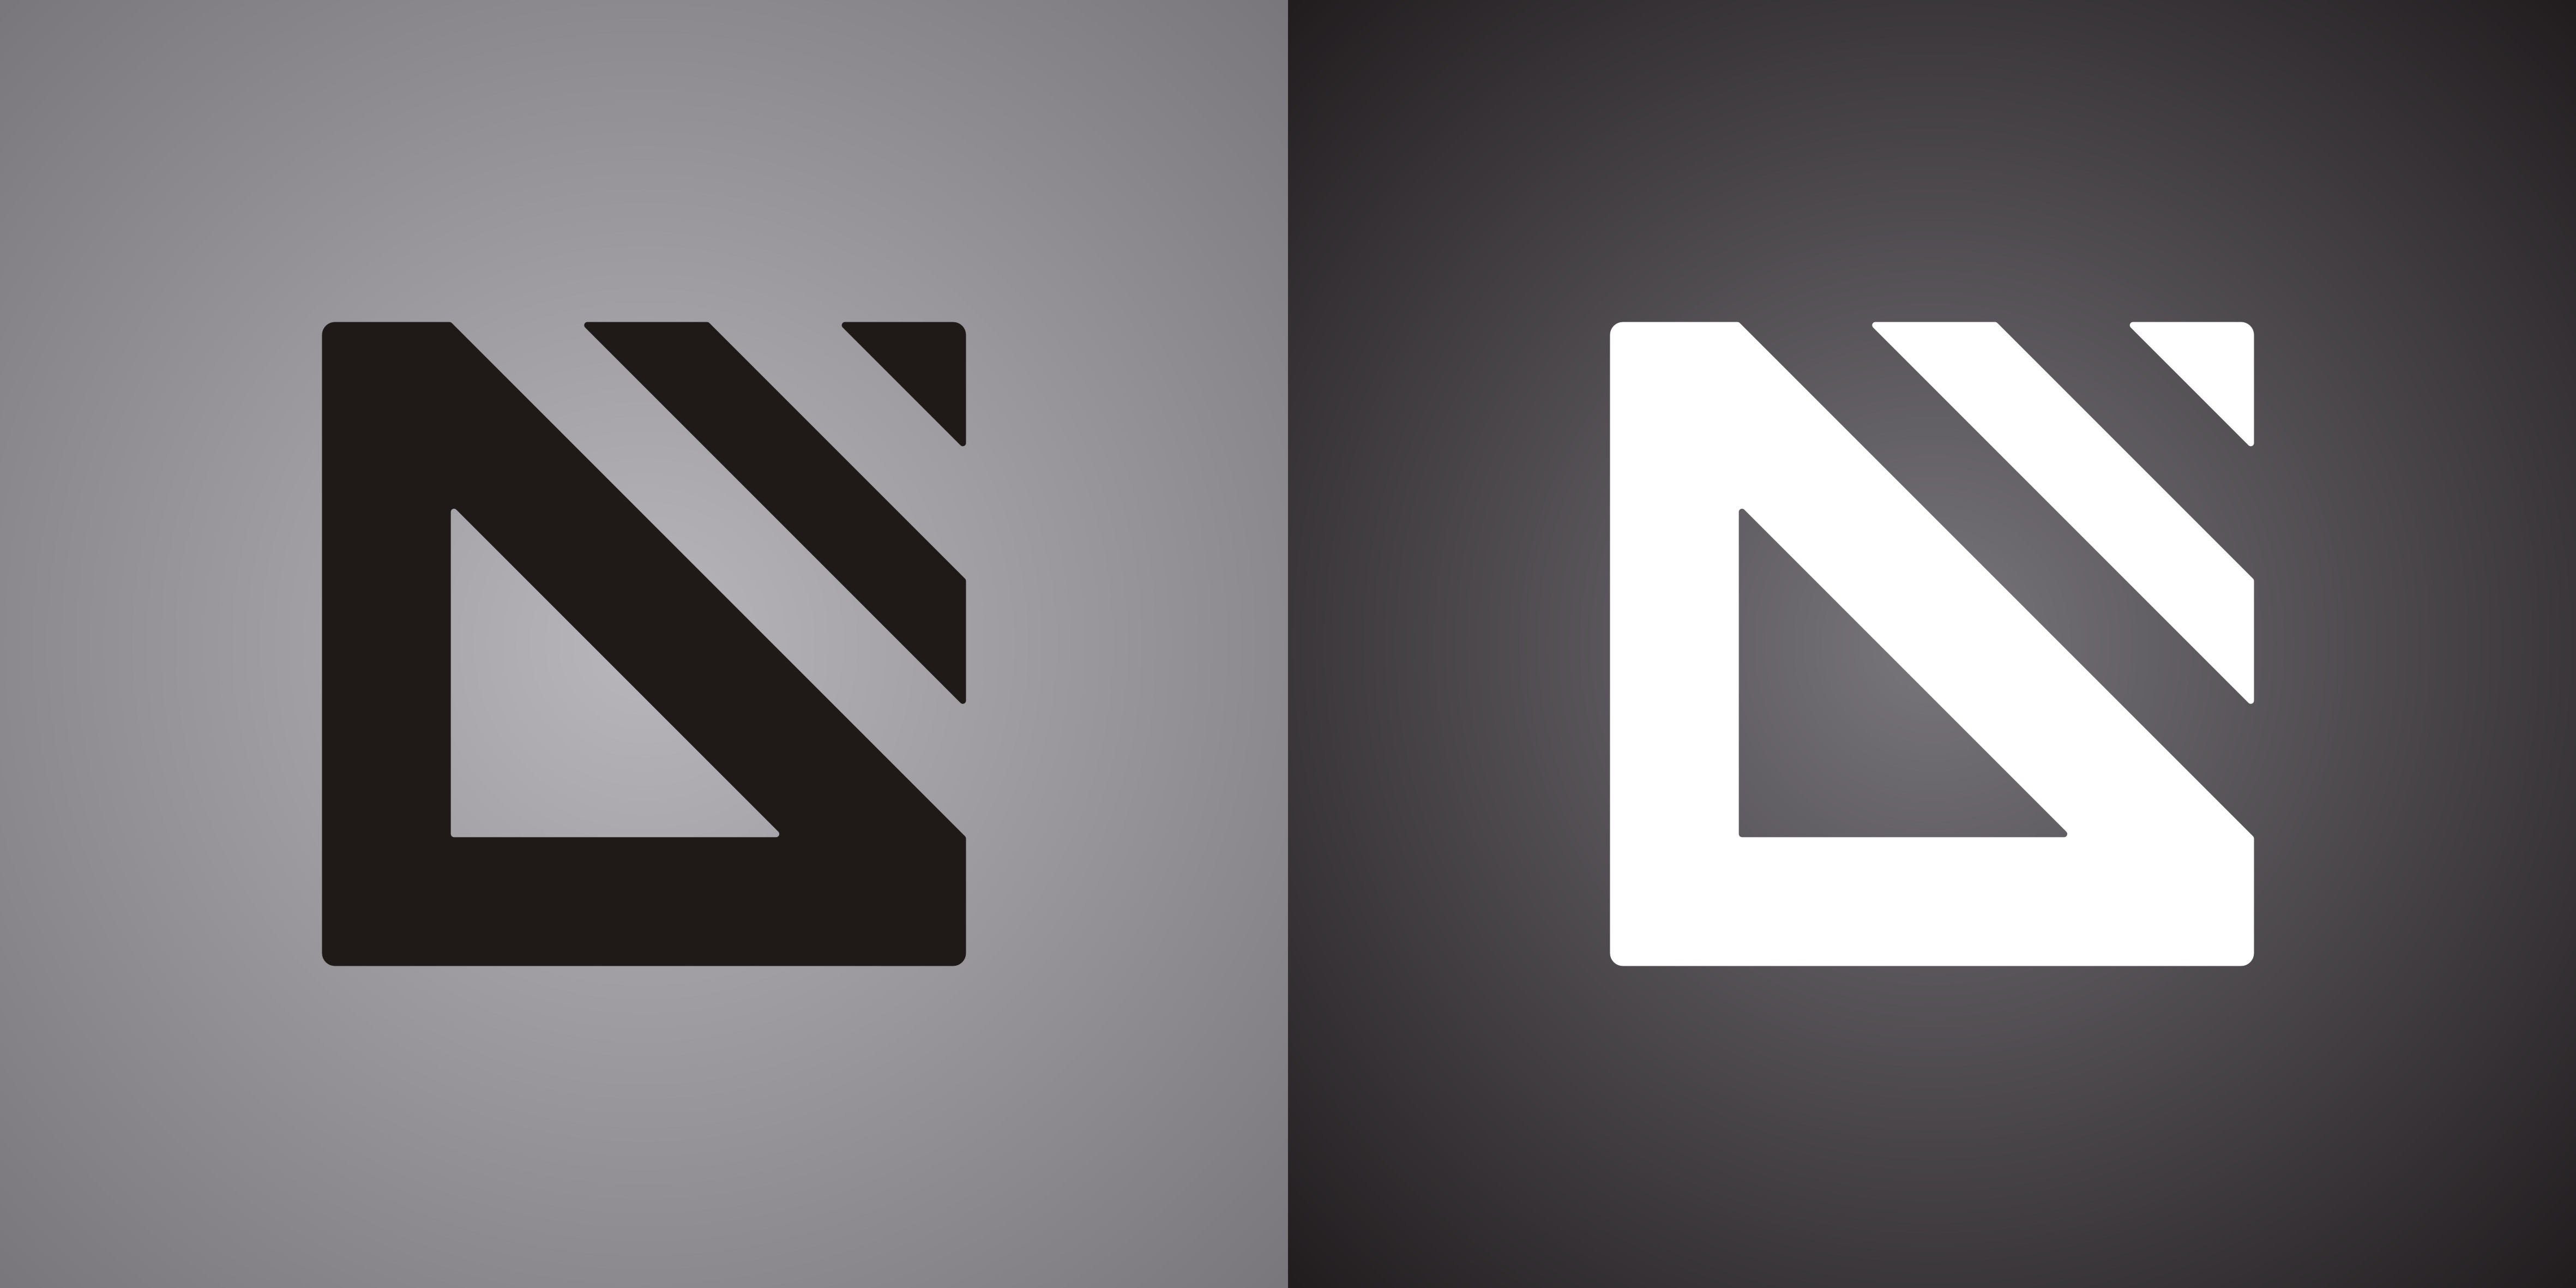 Разработка логотипа и фирменного стиля для КБ Прибой фото f_9015b2be1d389093.jpg